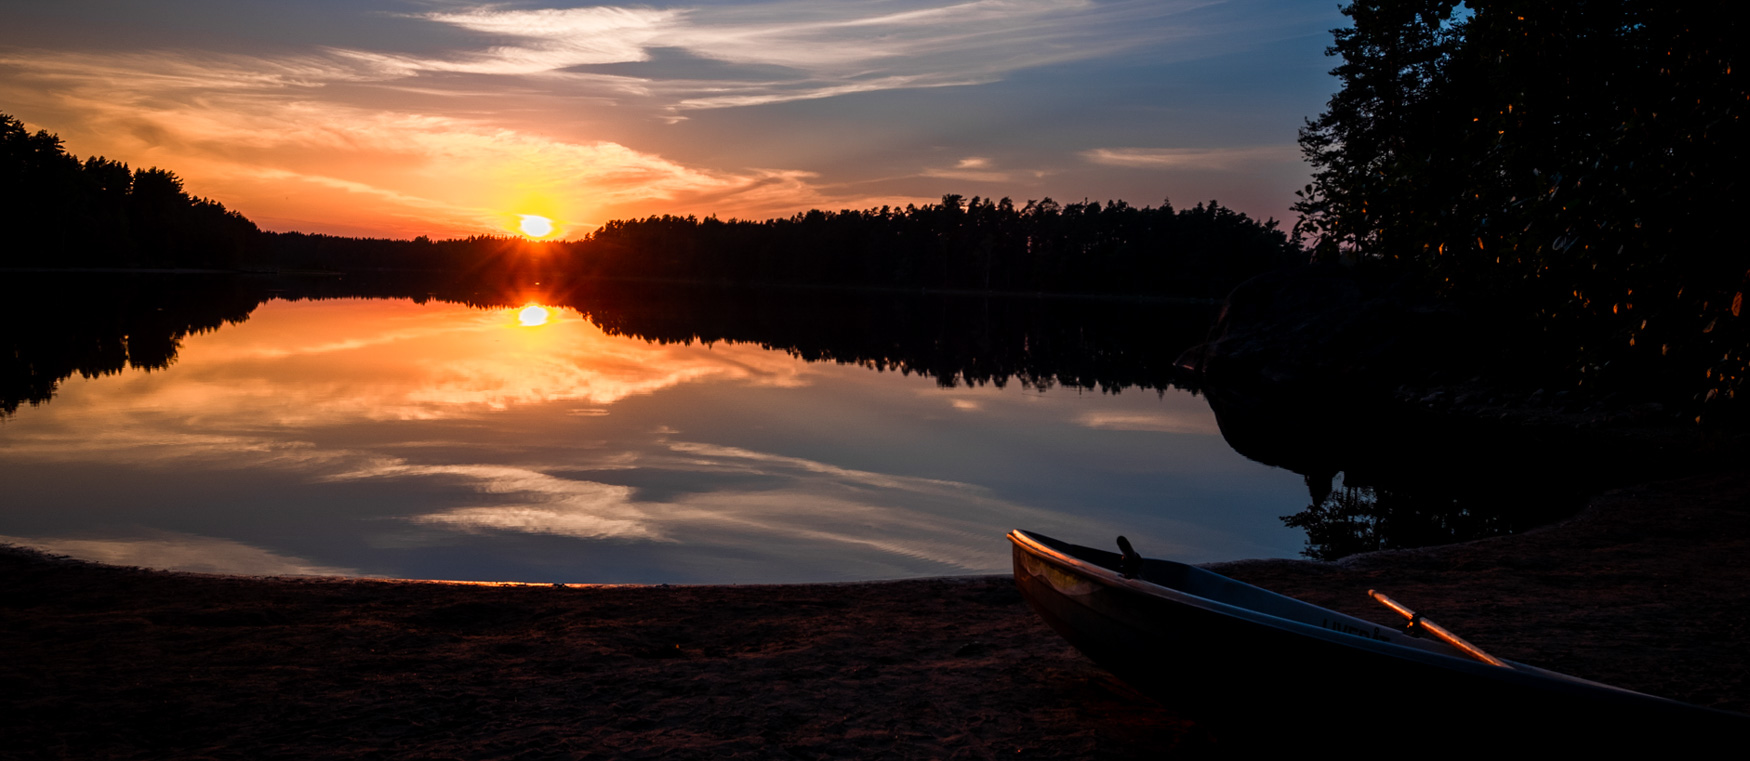 suedfinnland-highlight-teijo-nationalpark-sonnenuntergang